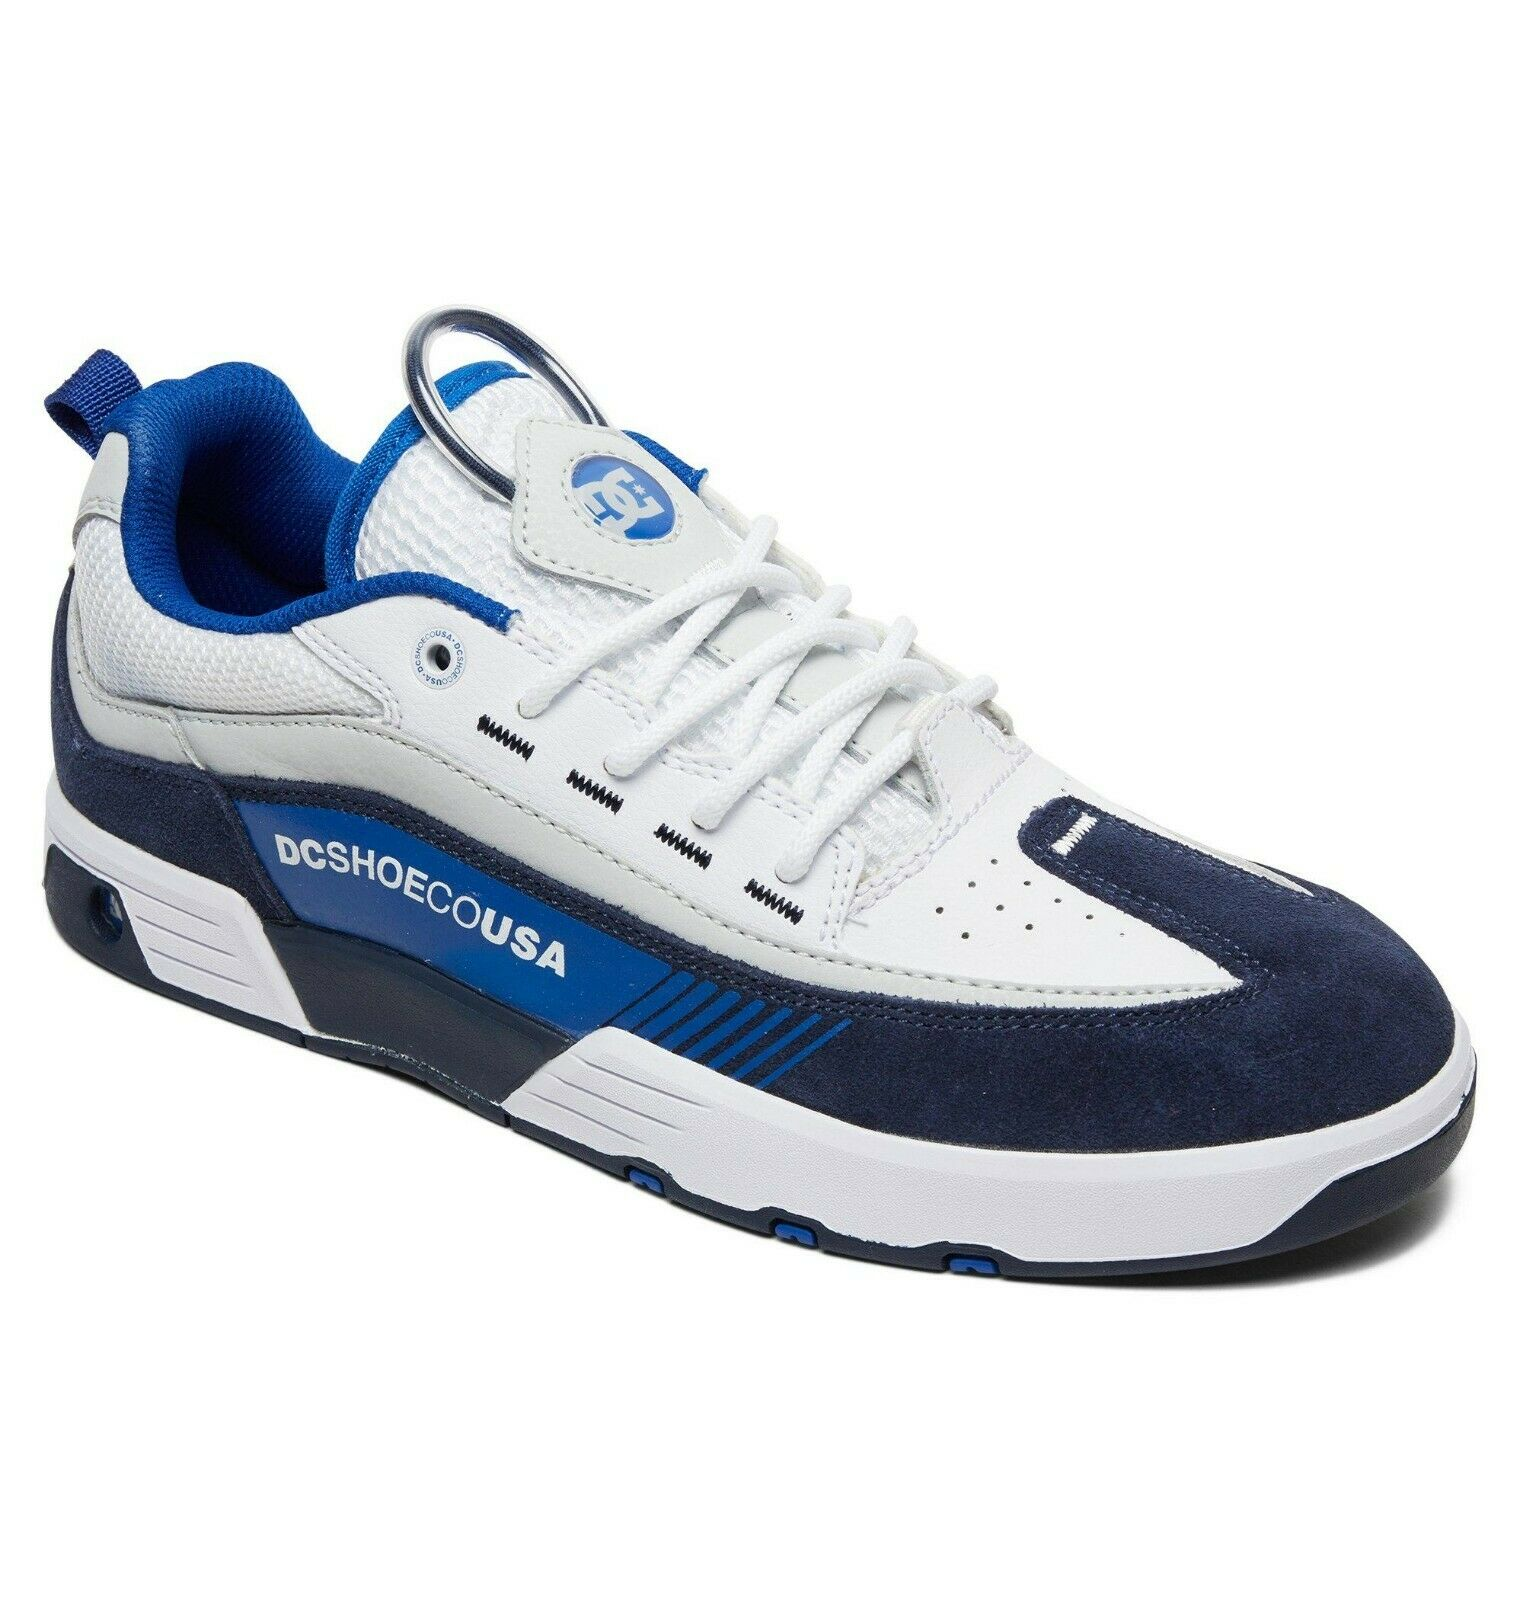 Dc scarpe scarpe scarpe Legacy 98 Slim Bianco - Blu Adys100445 Xwbb Uomo Numeri 1f12f6